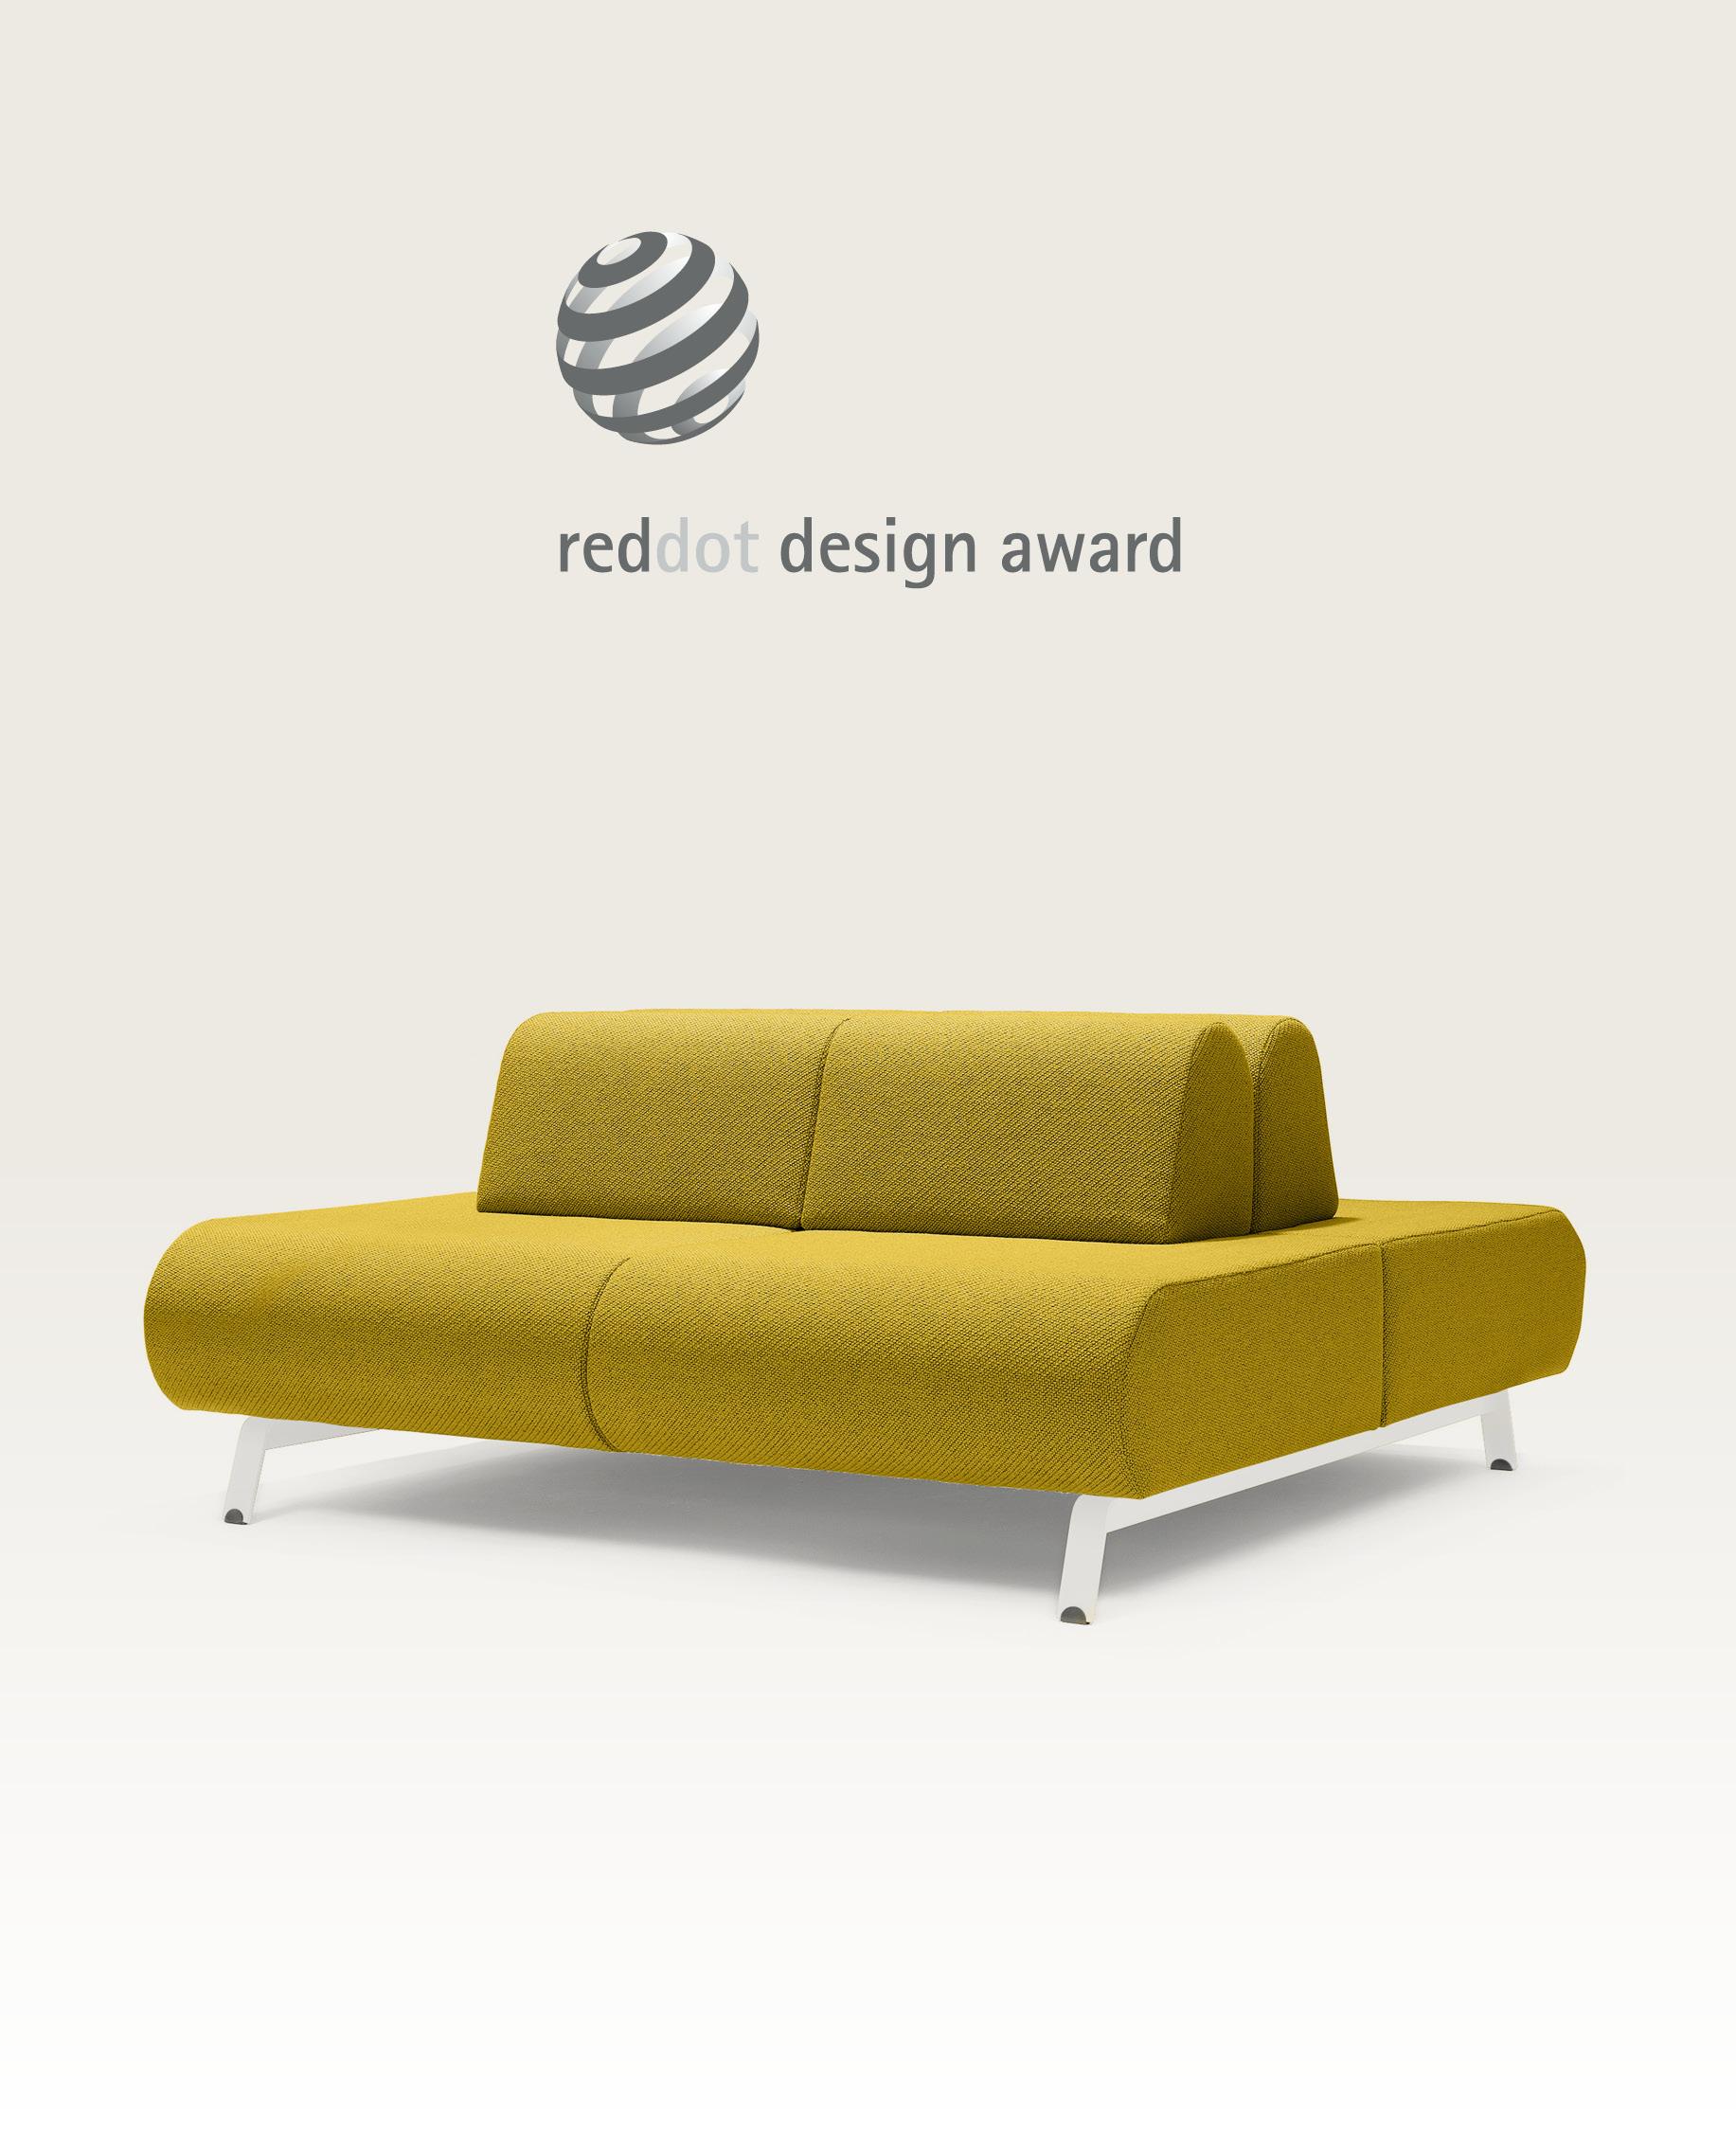 casala basso reddot design award